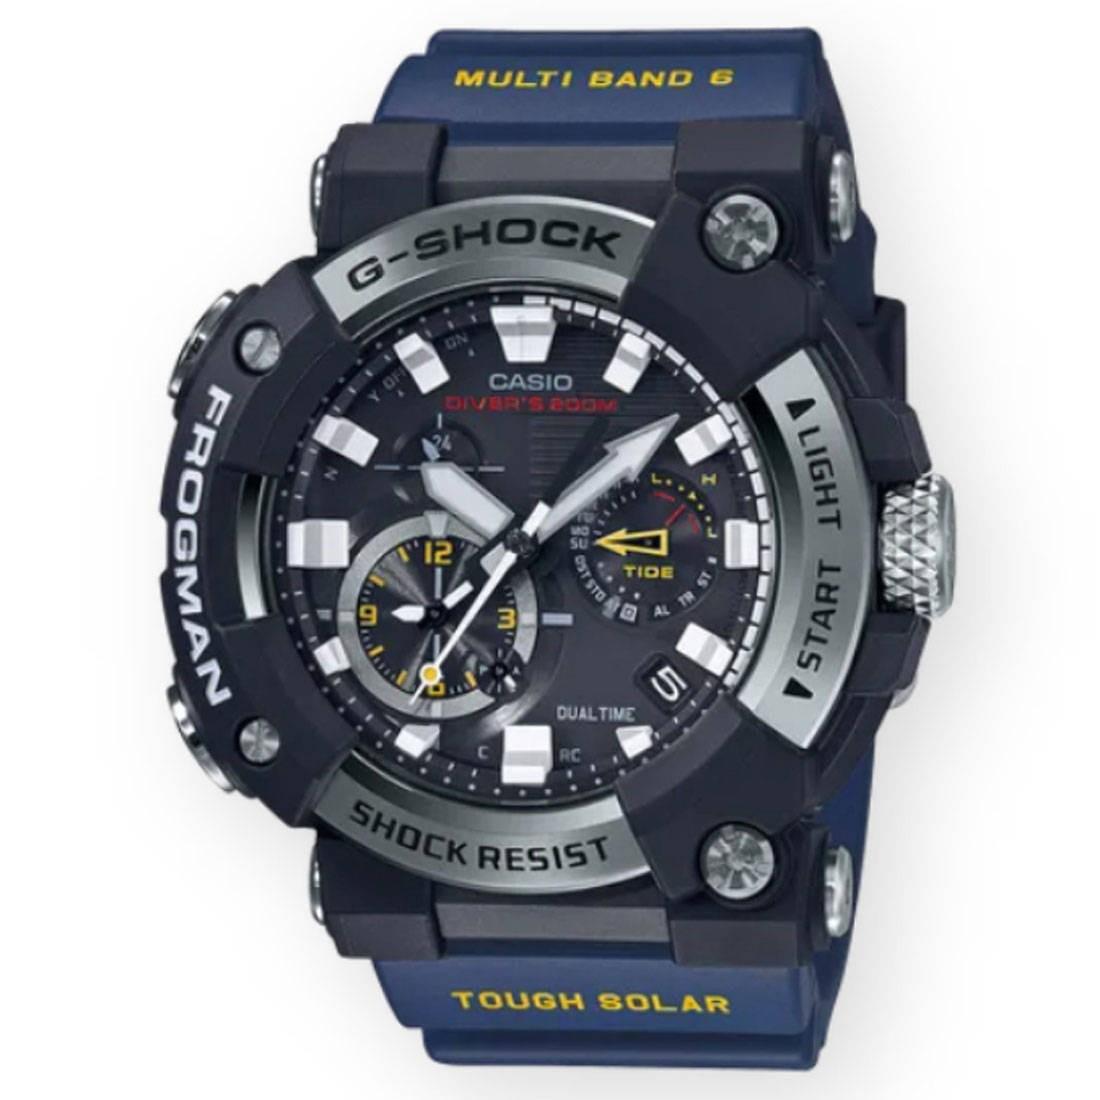 G-Shock Watches GWFA1000 Frogman Watch (blue / navy)